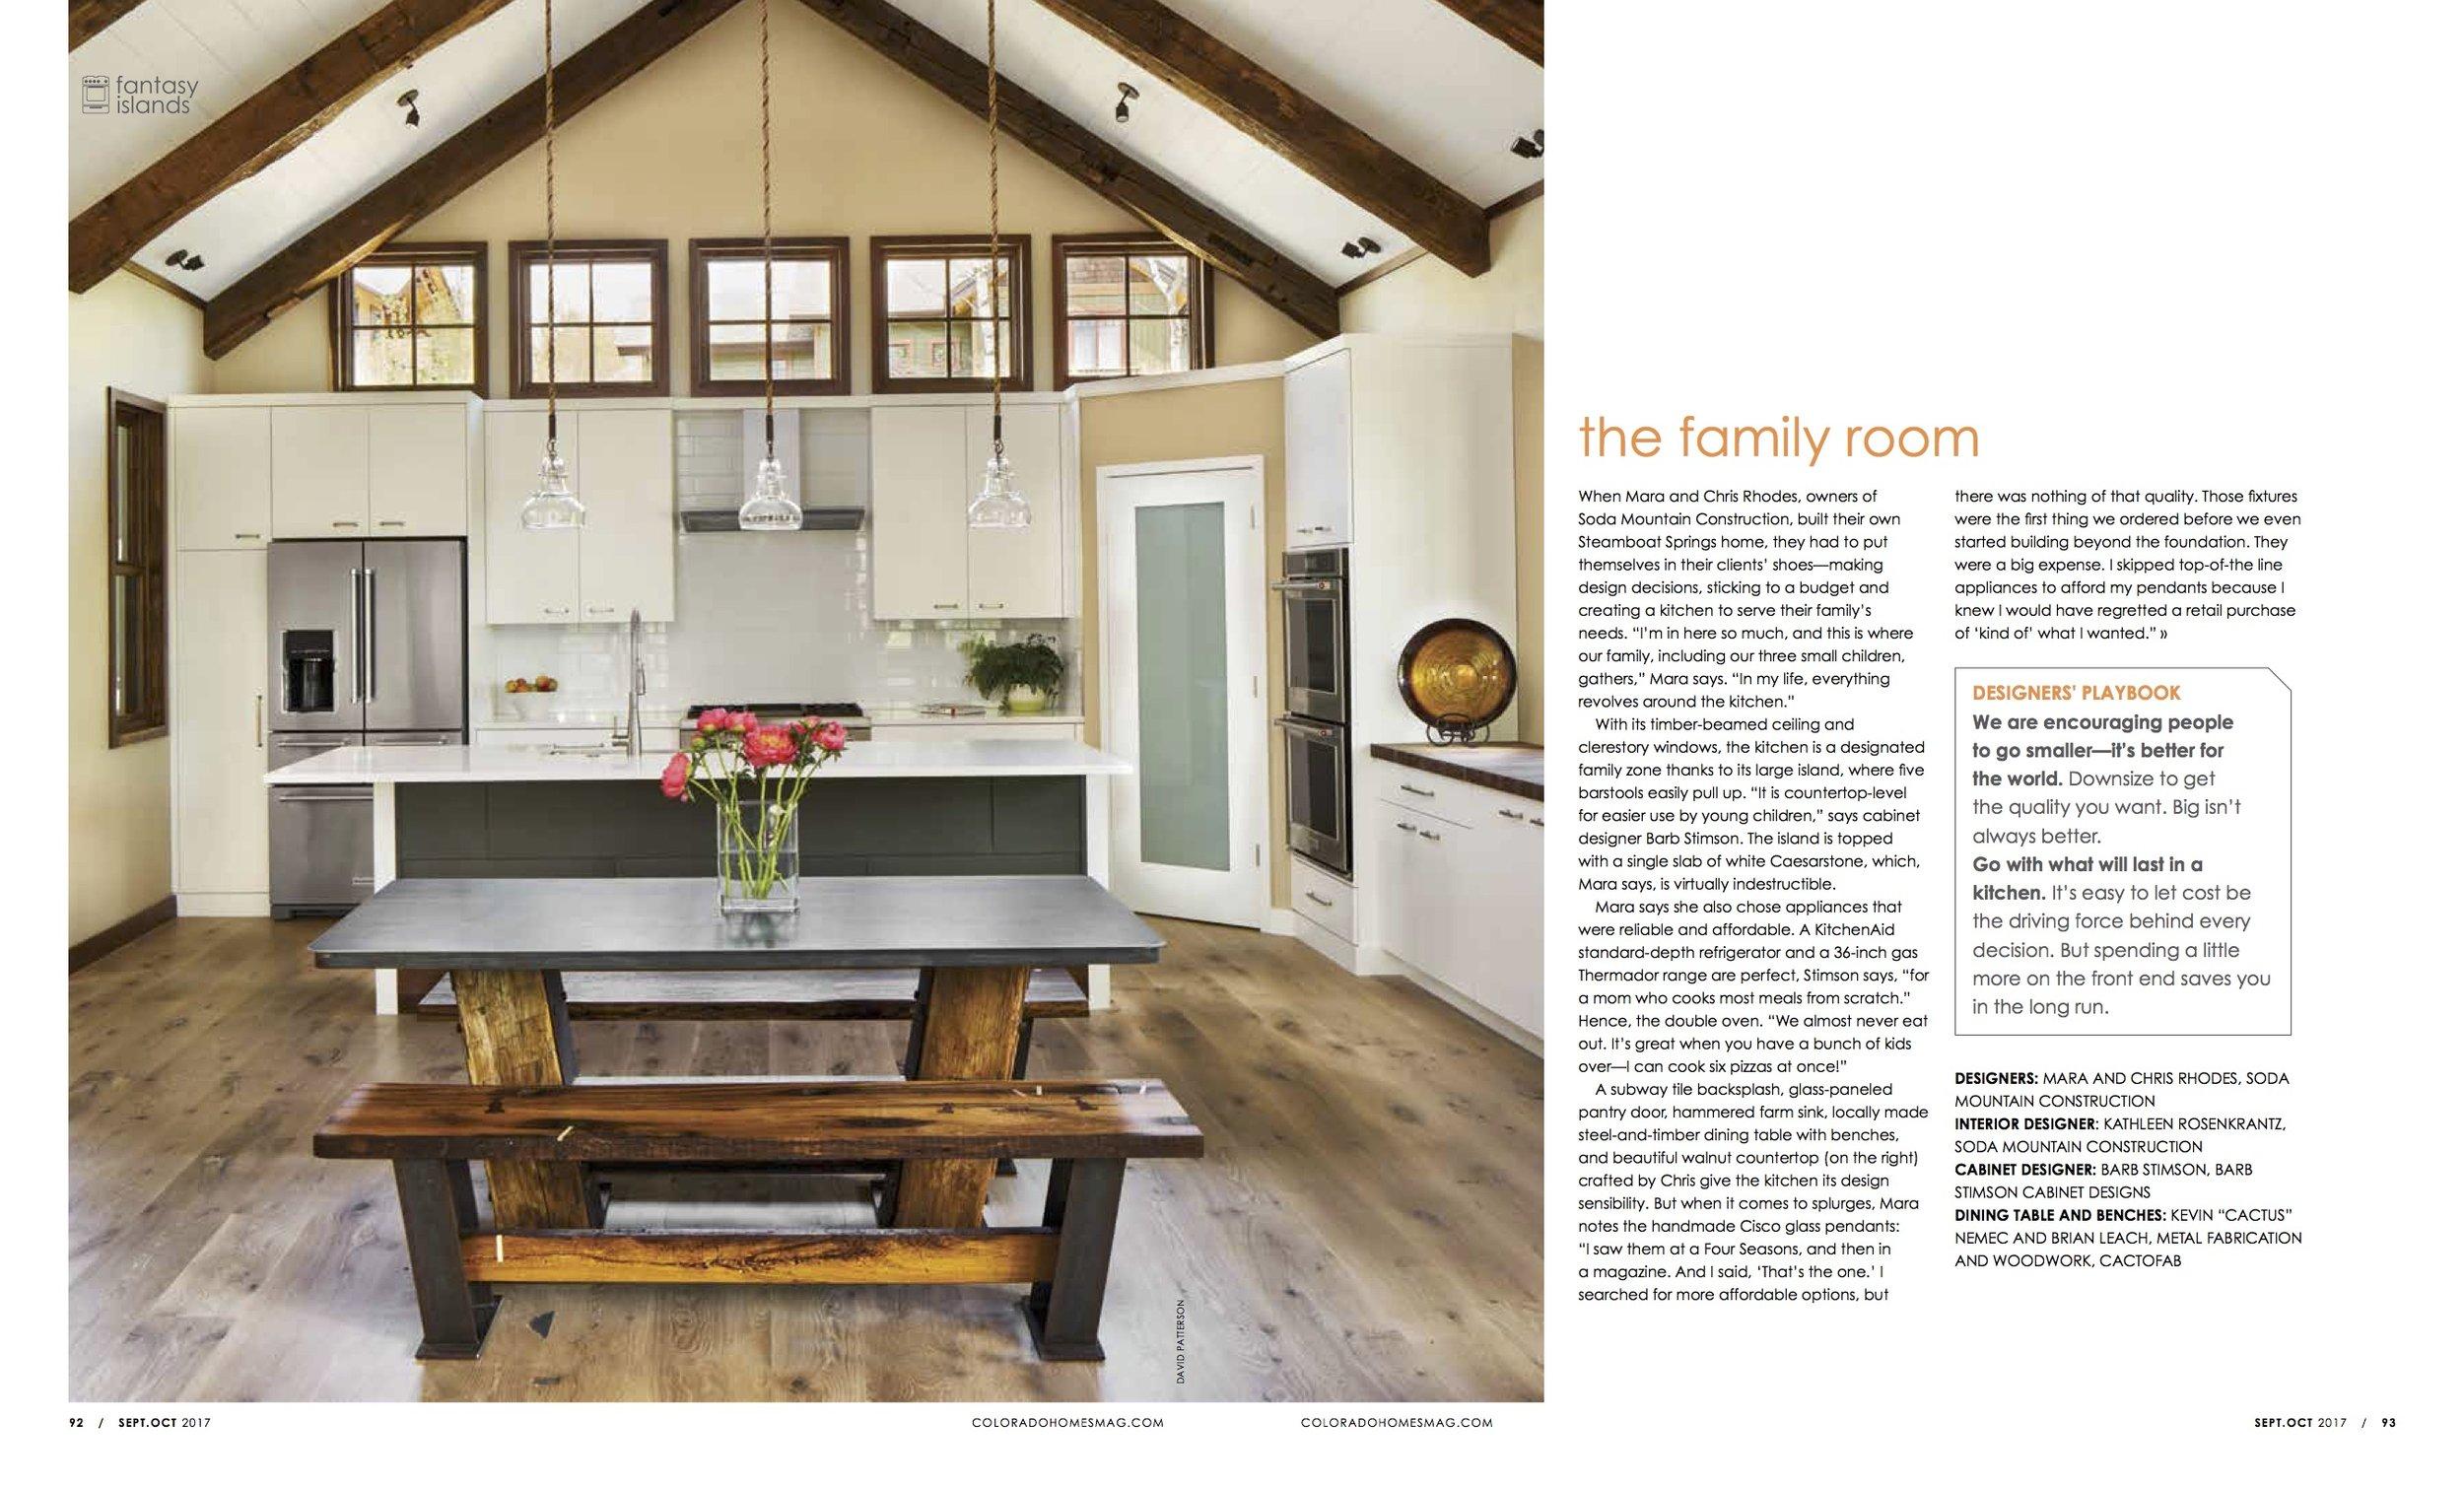 kitchens sp2.jpg